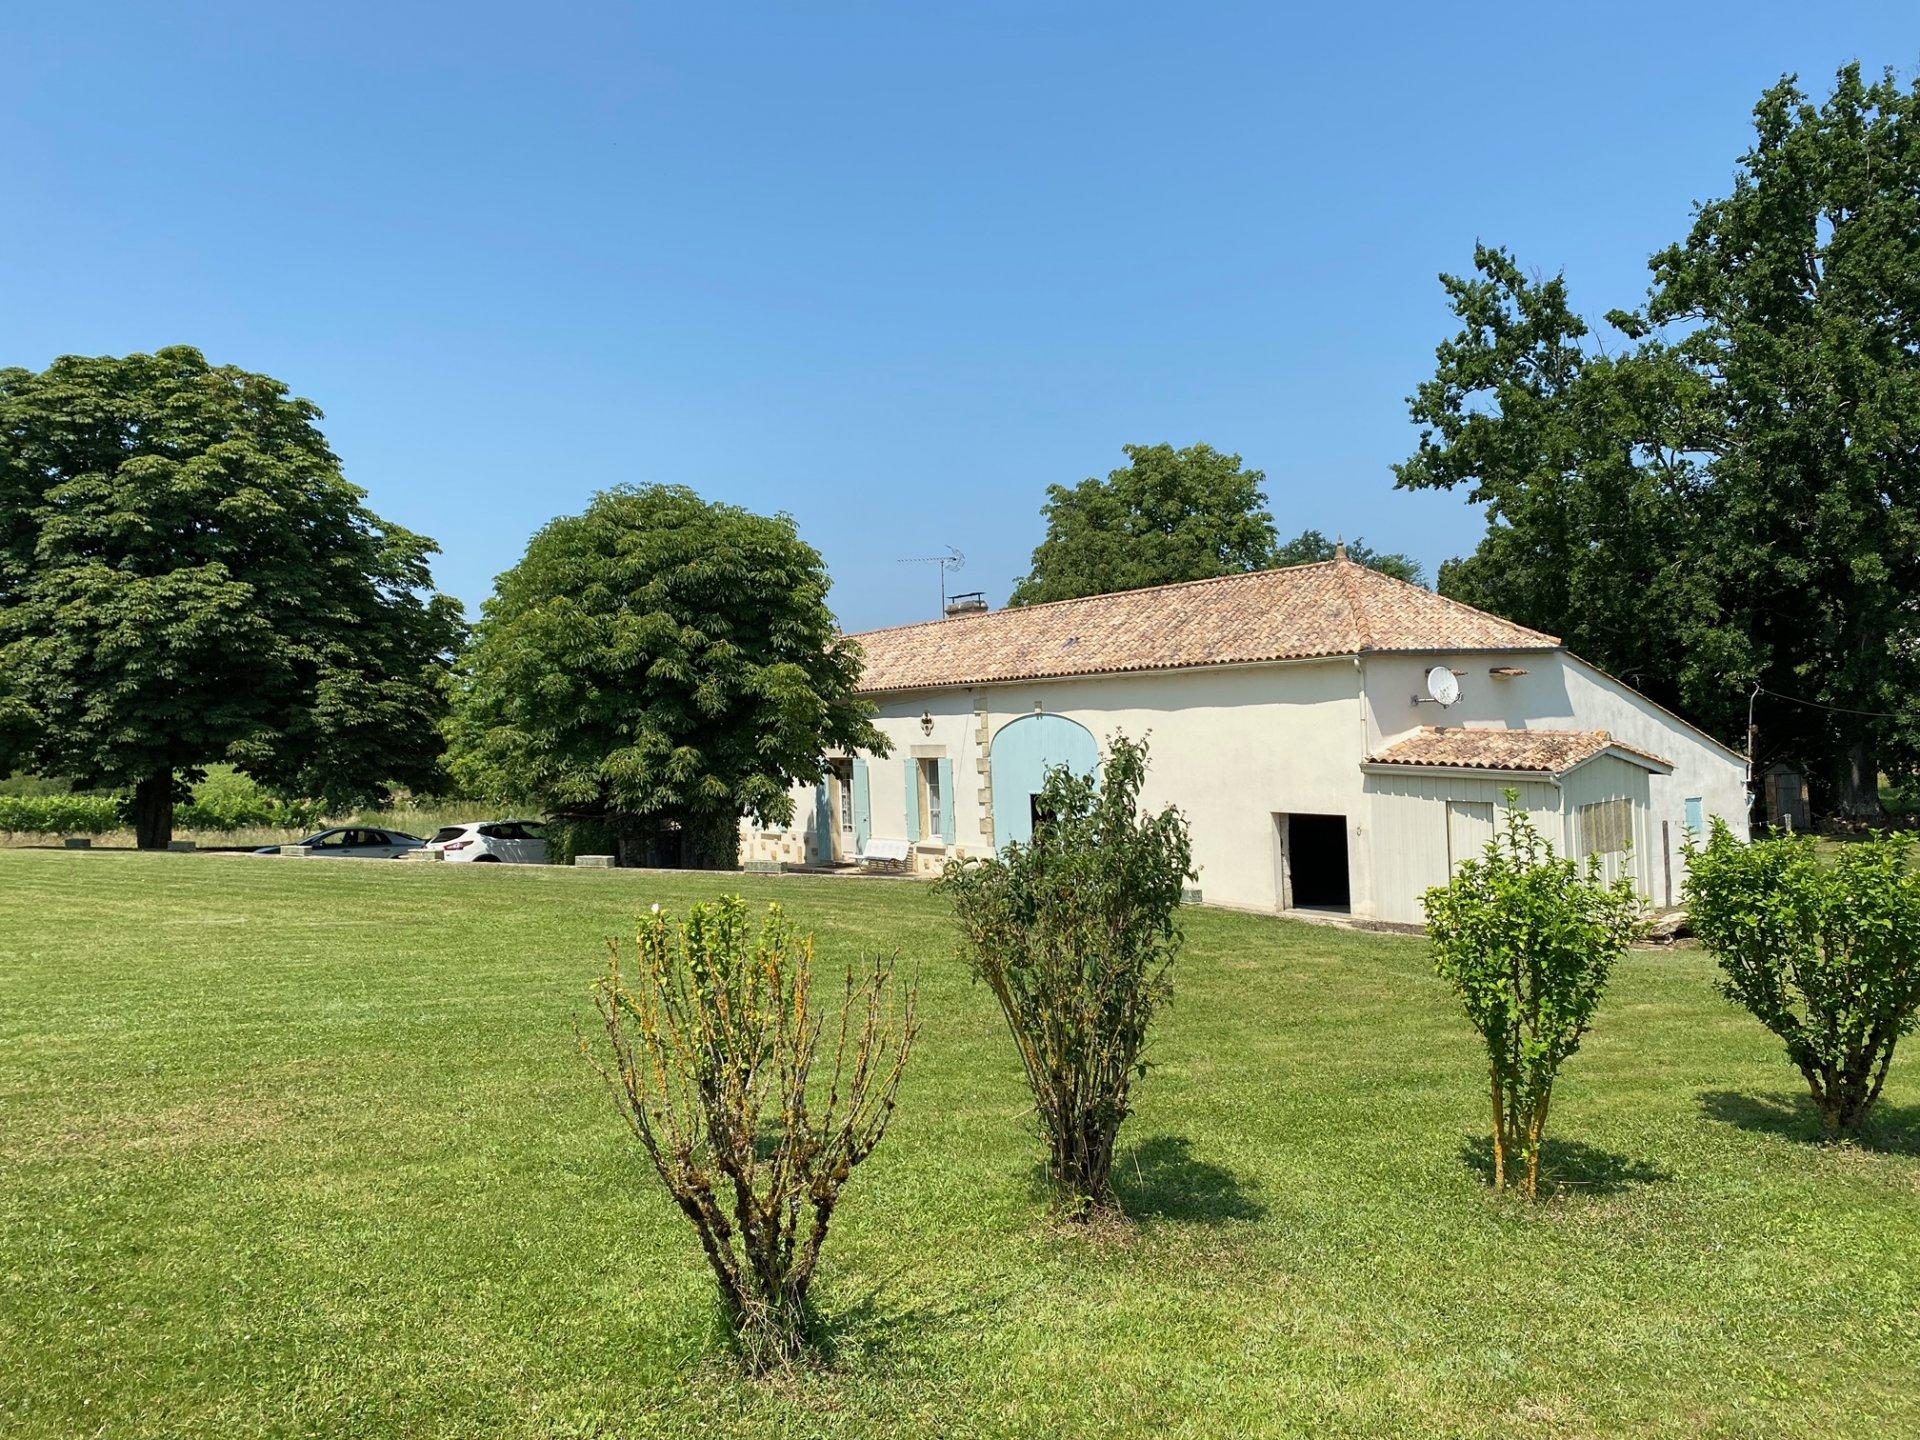 Near Sauveterre de Guyenne